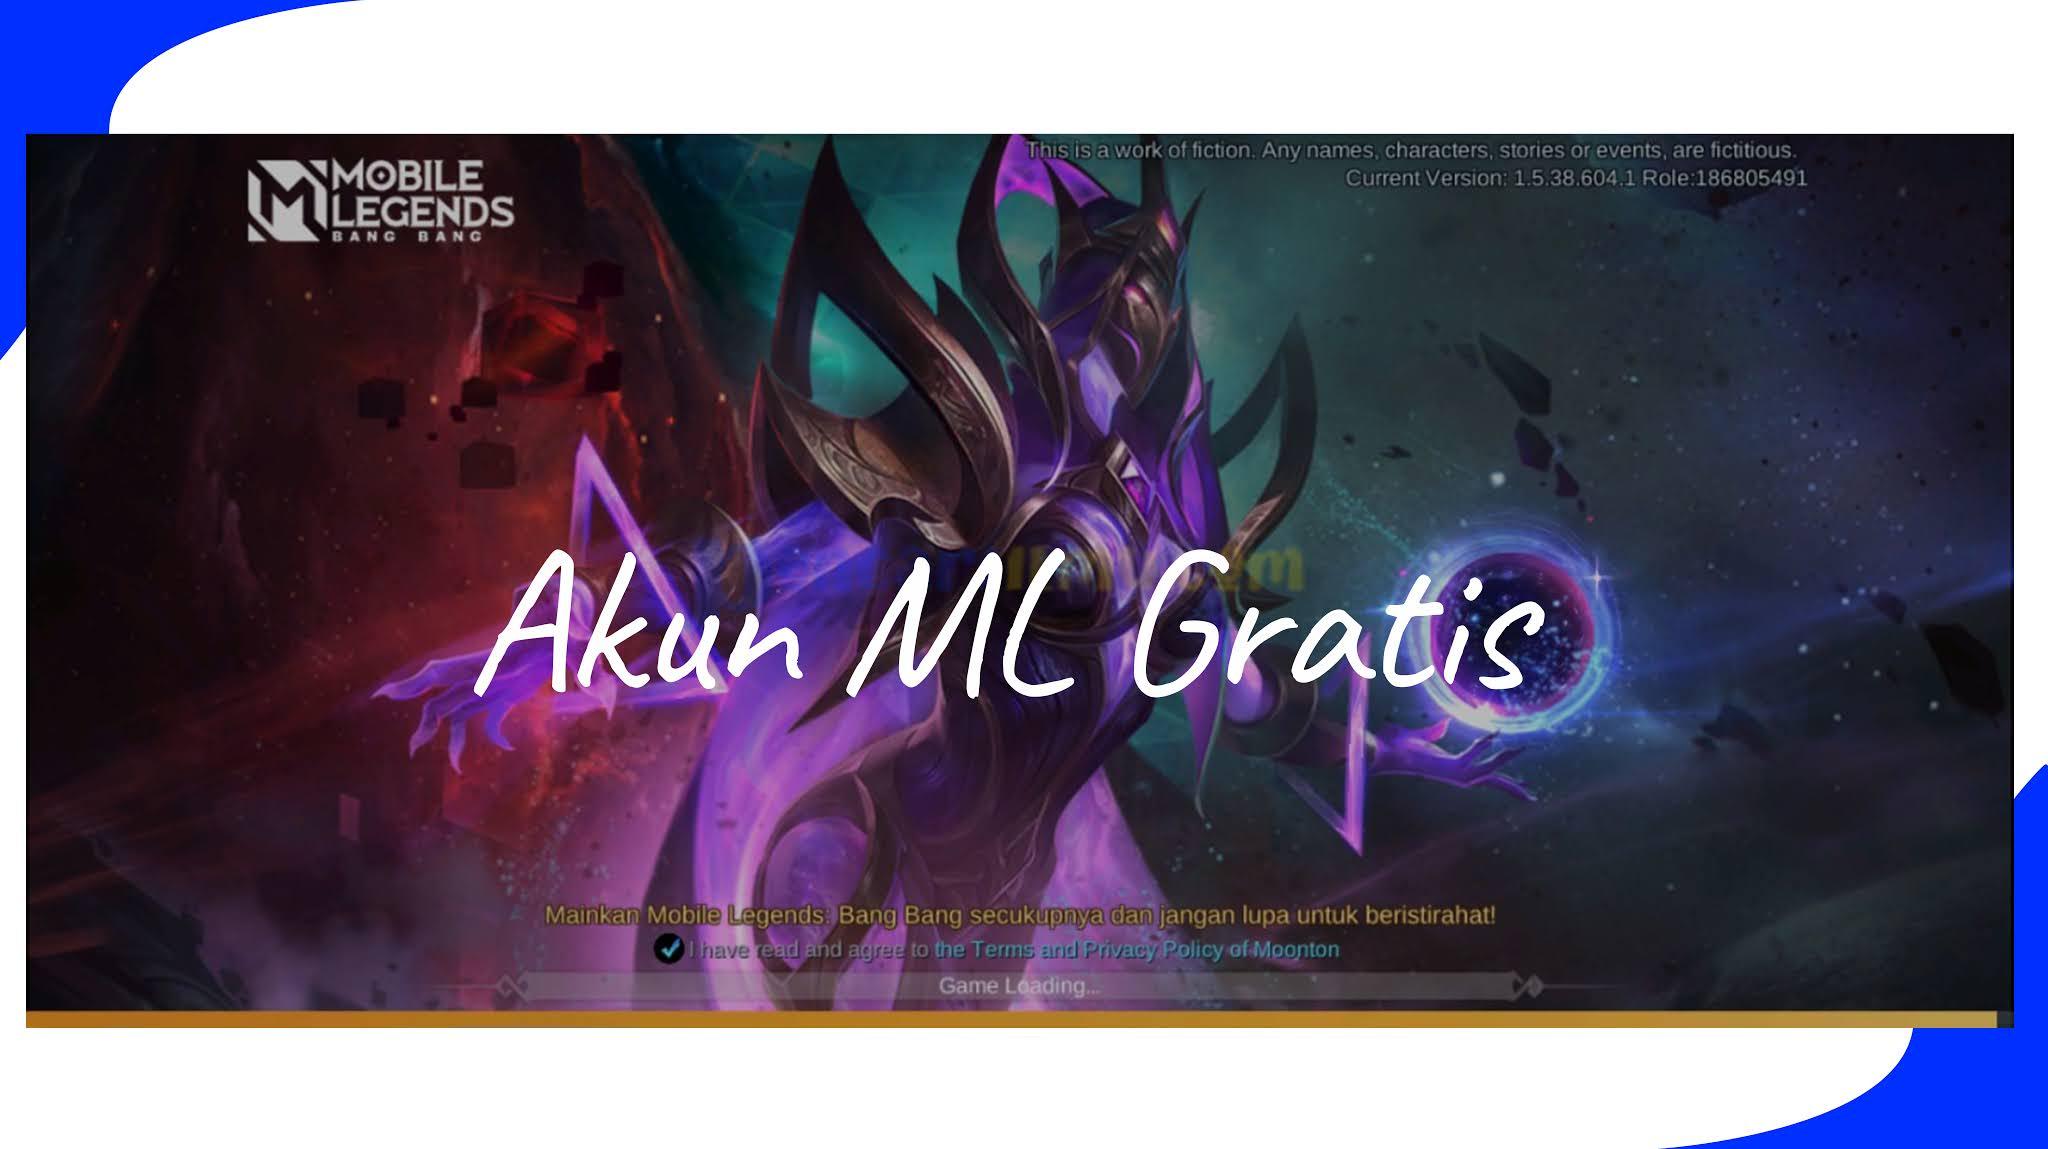 Akun Ml Sultan Dan Mythic Gratis